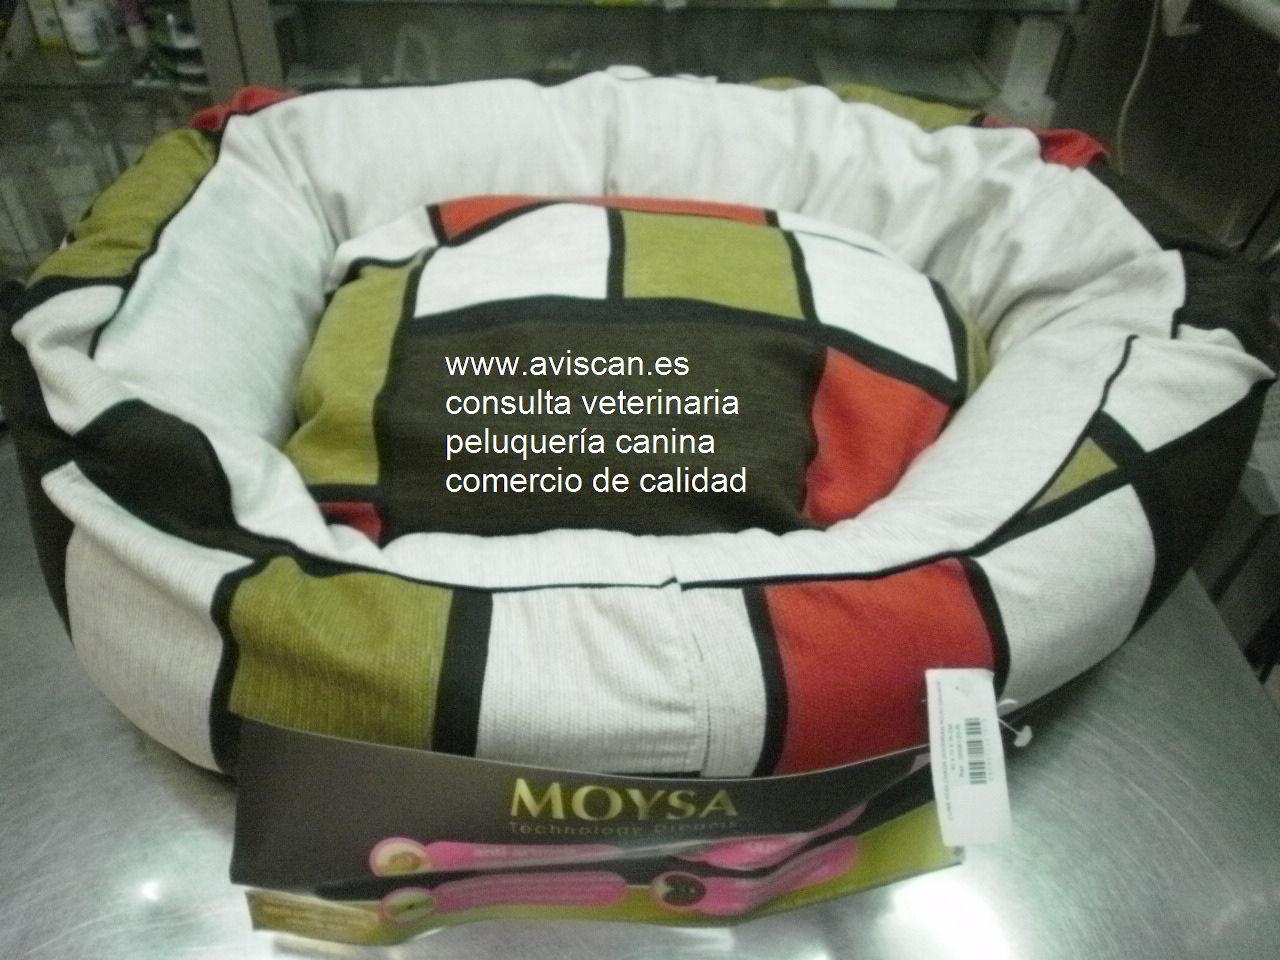 Cama descanso saludable Dogdrian de Moysa